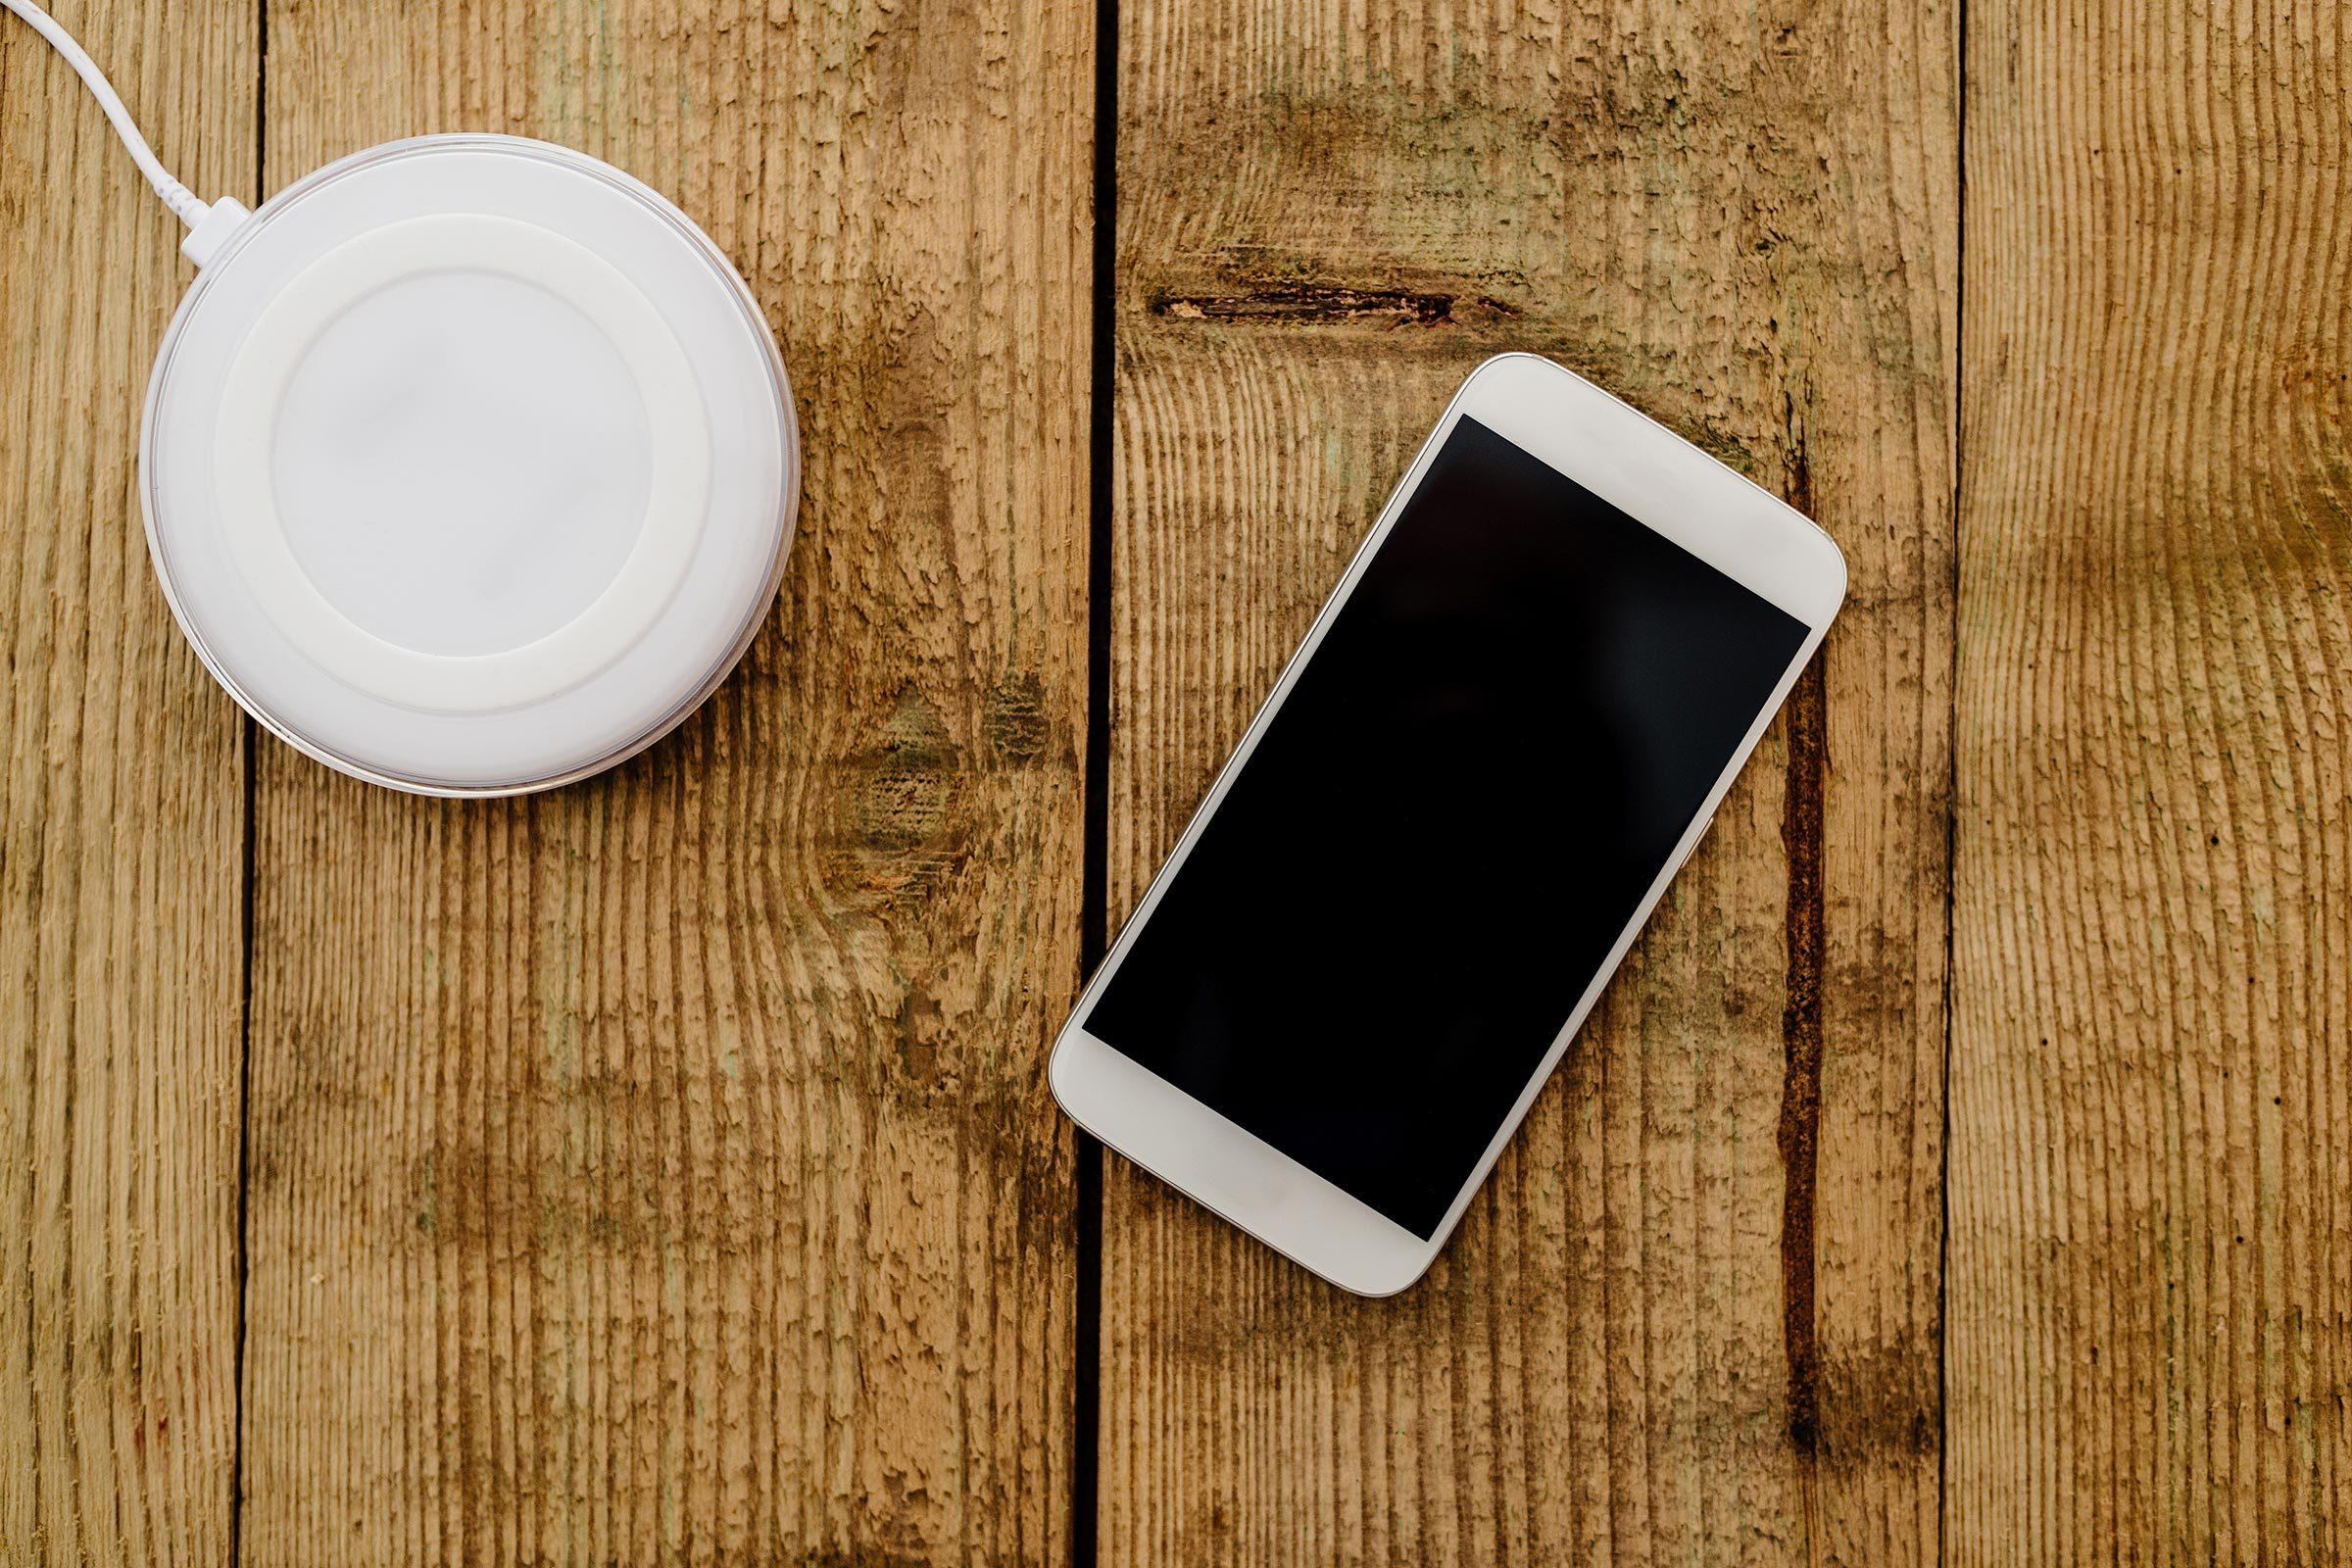 phone wireless charge pad